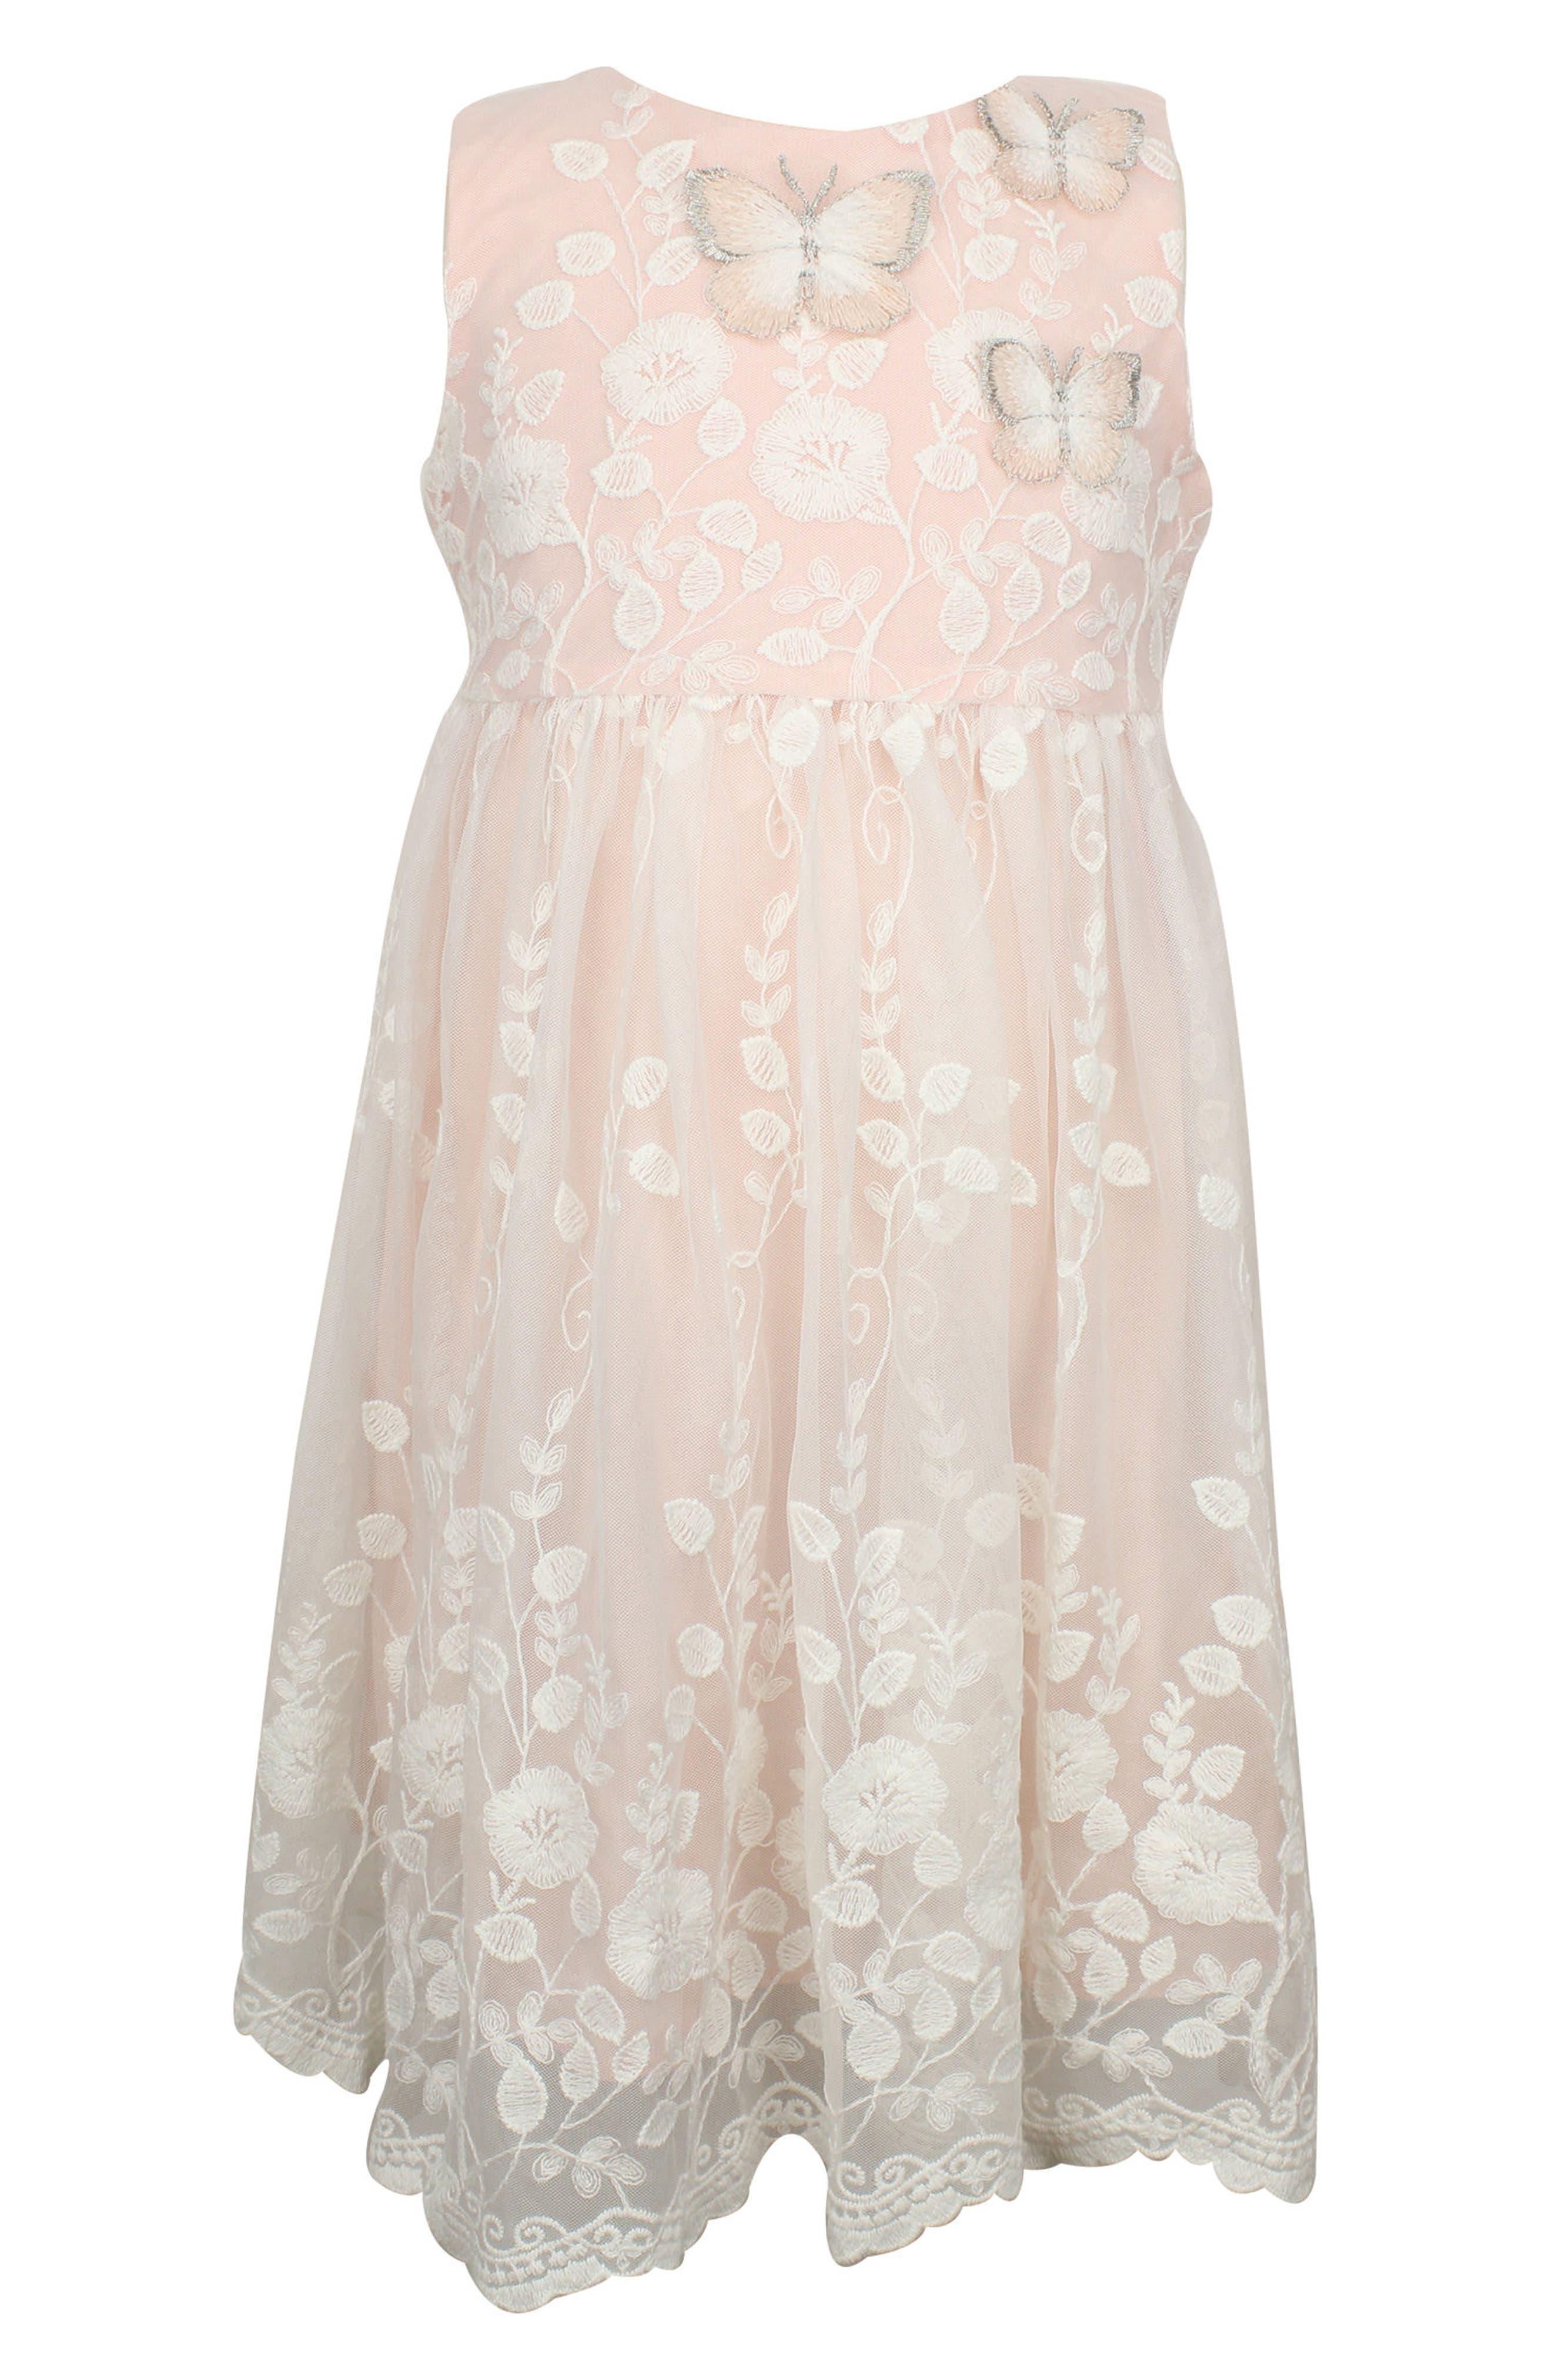 POPATU, Lace Overlay Sleeveless Dress, Main thumbnail 1, color, IVORY